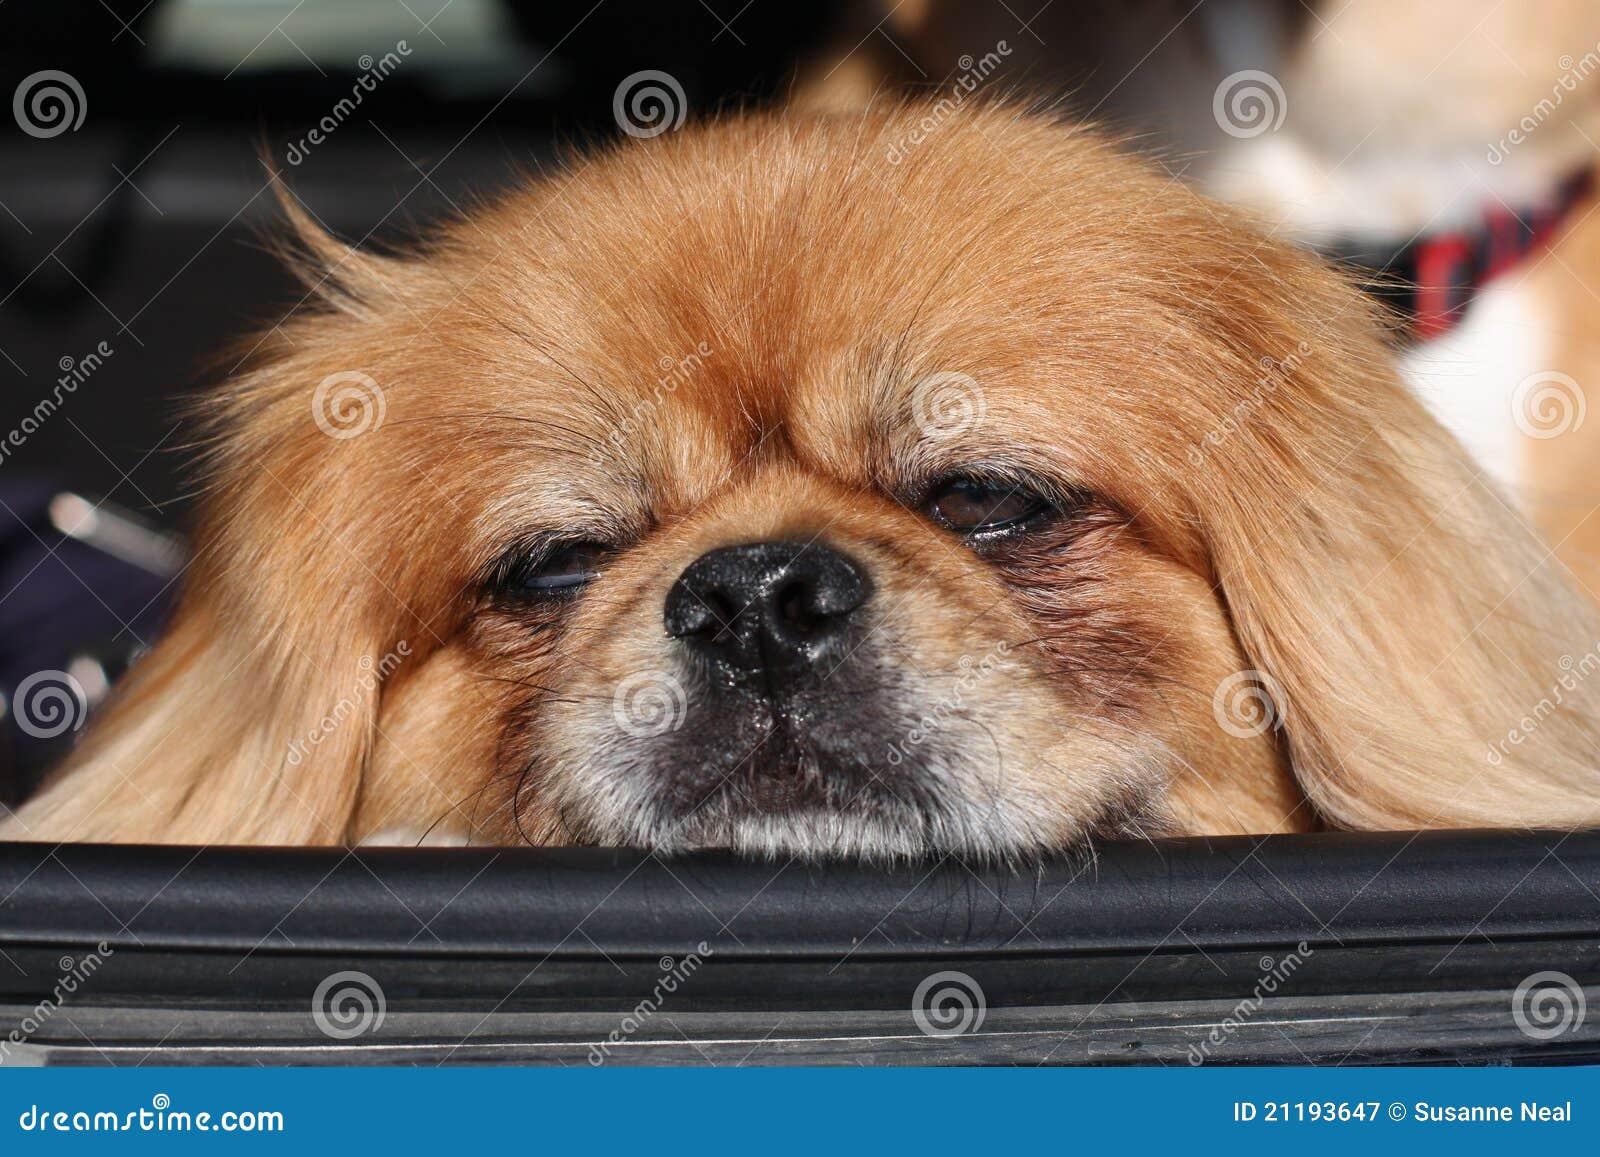 Pekingese resting head on car window